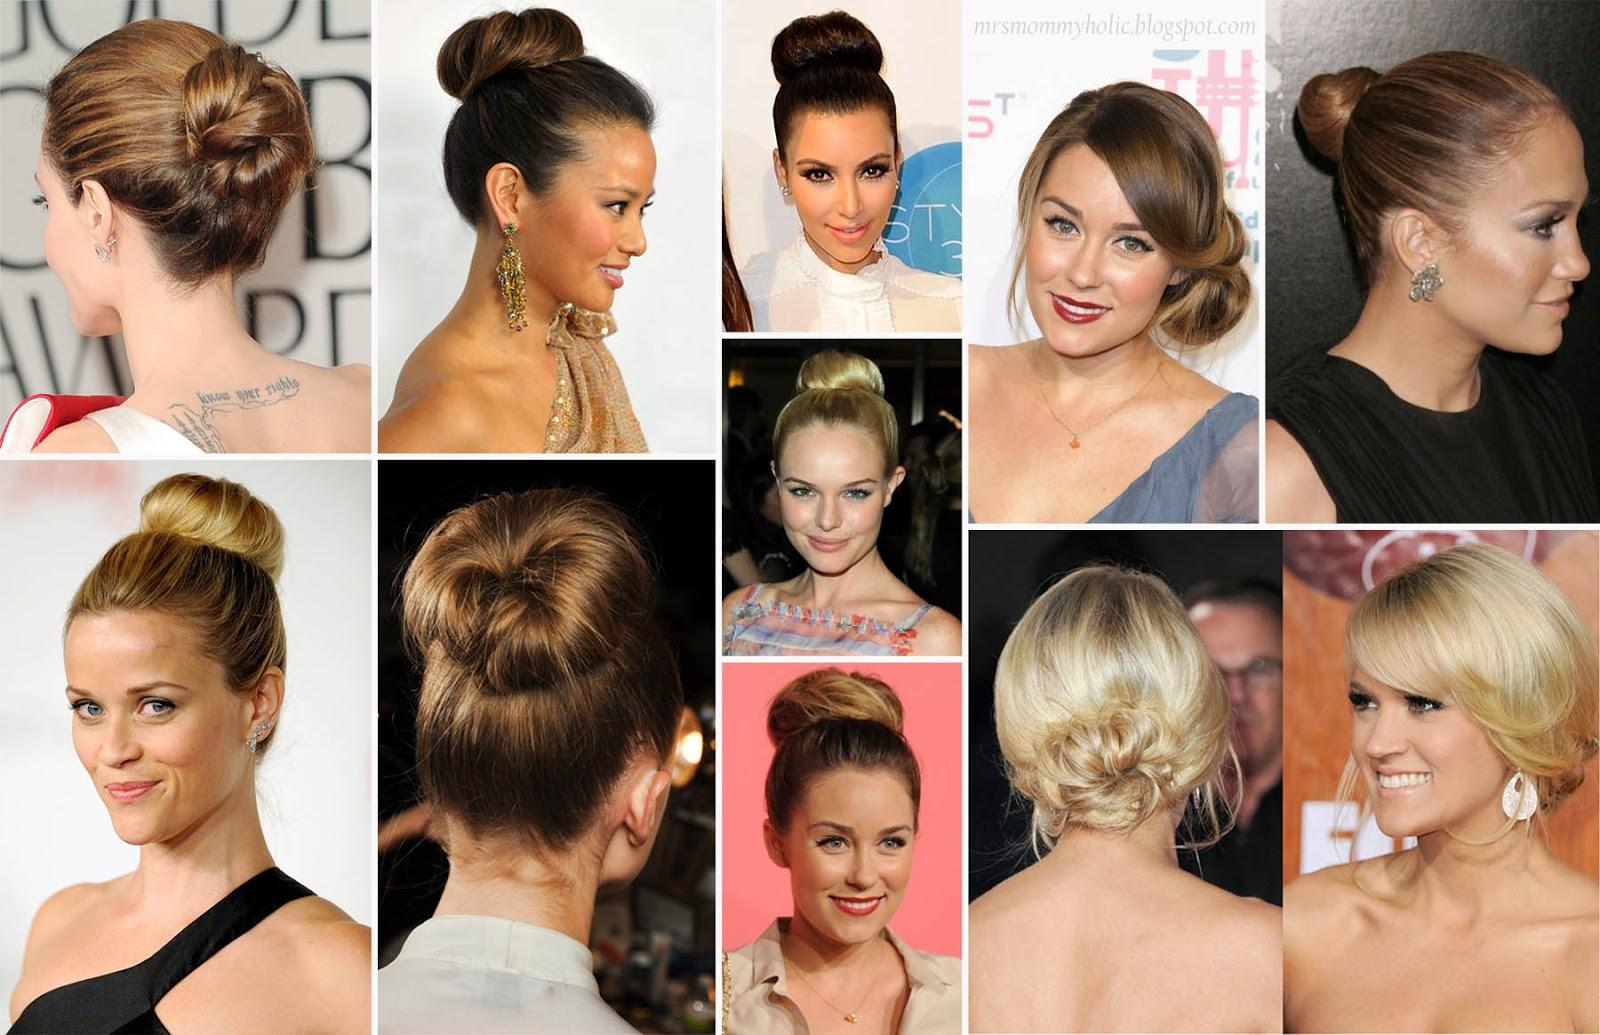 Miraculous Mrsmommyholic Easiest Hairstyle Ever The Donut Bun Short Hairstyles For Black Women Fulllsitofus